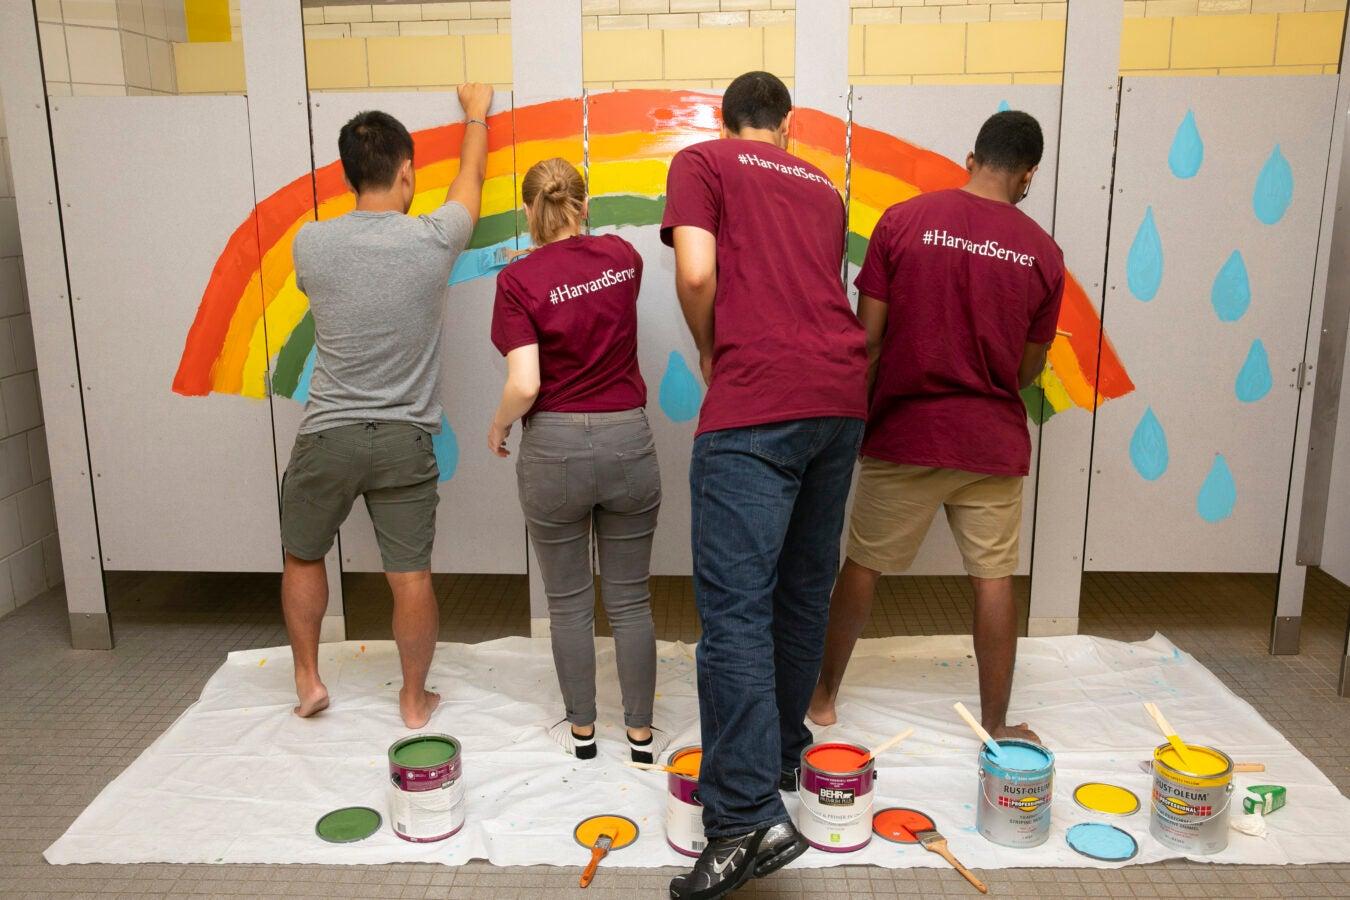 Students paint bathroom stall doors.